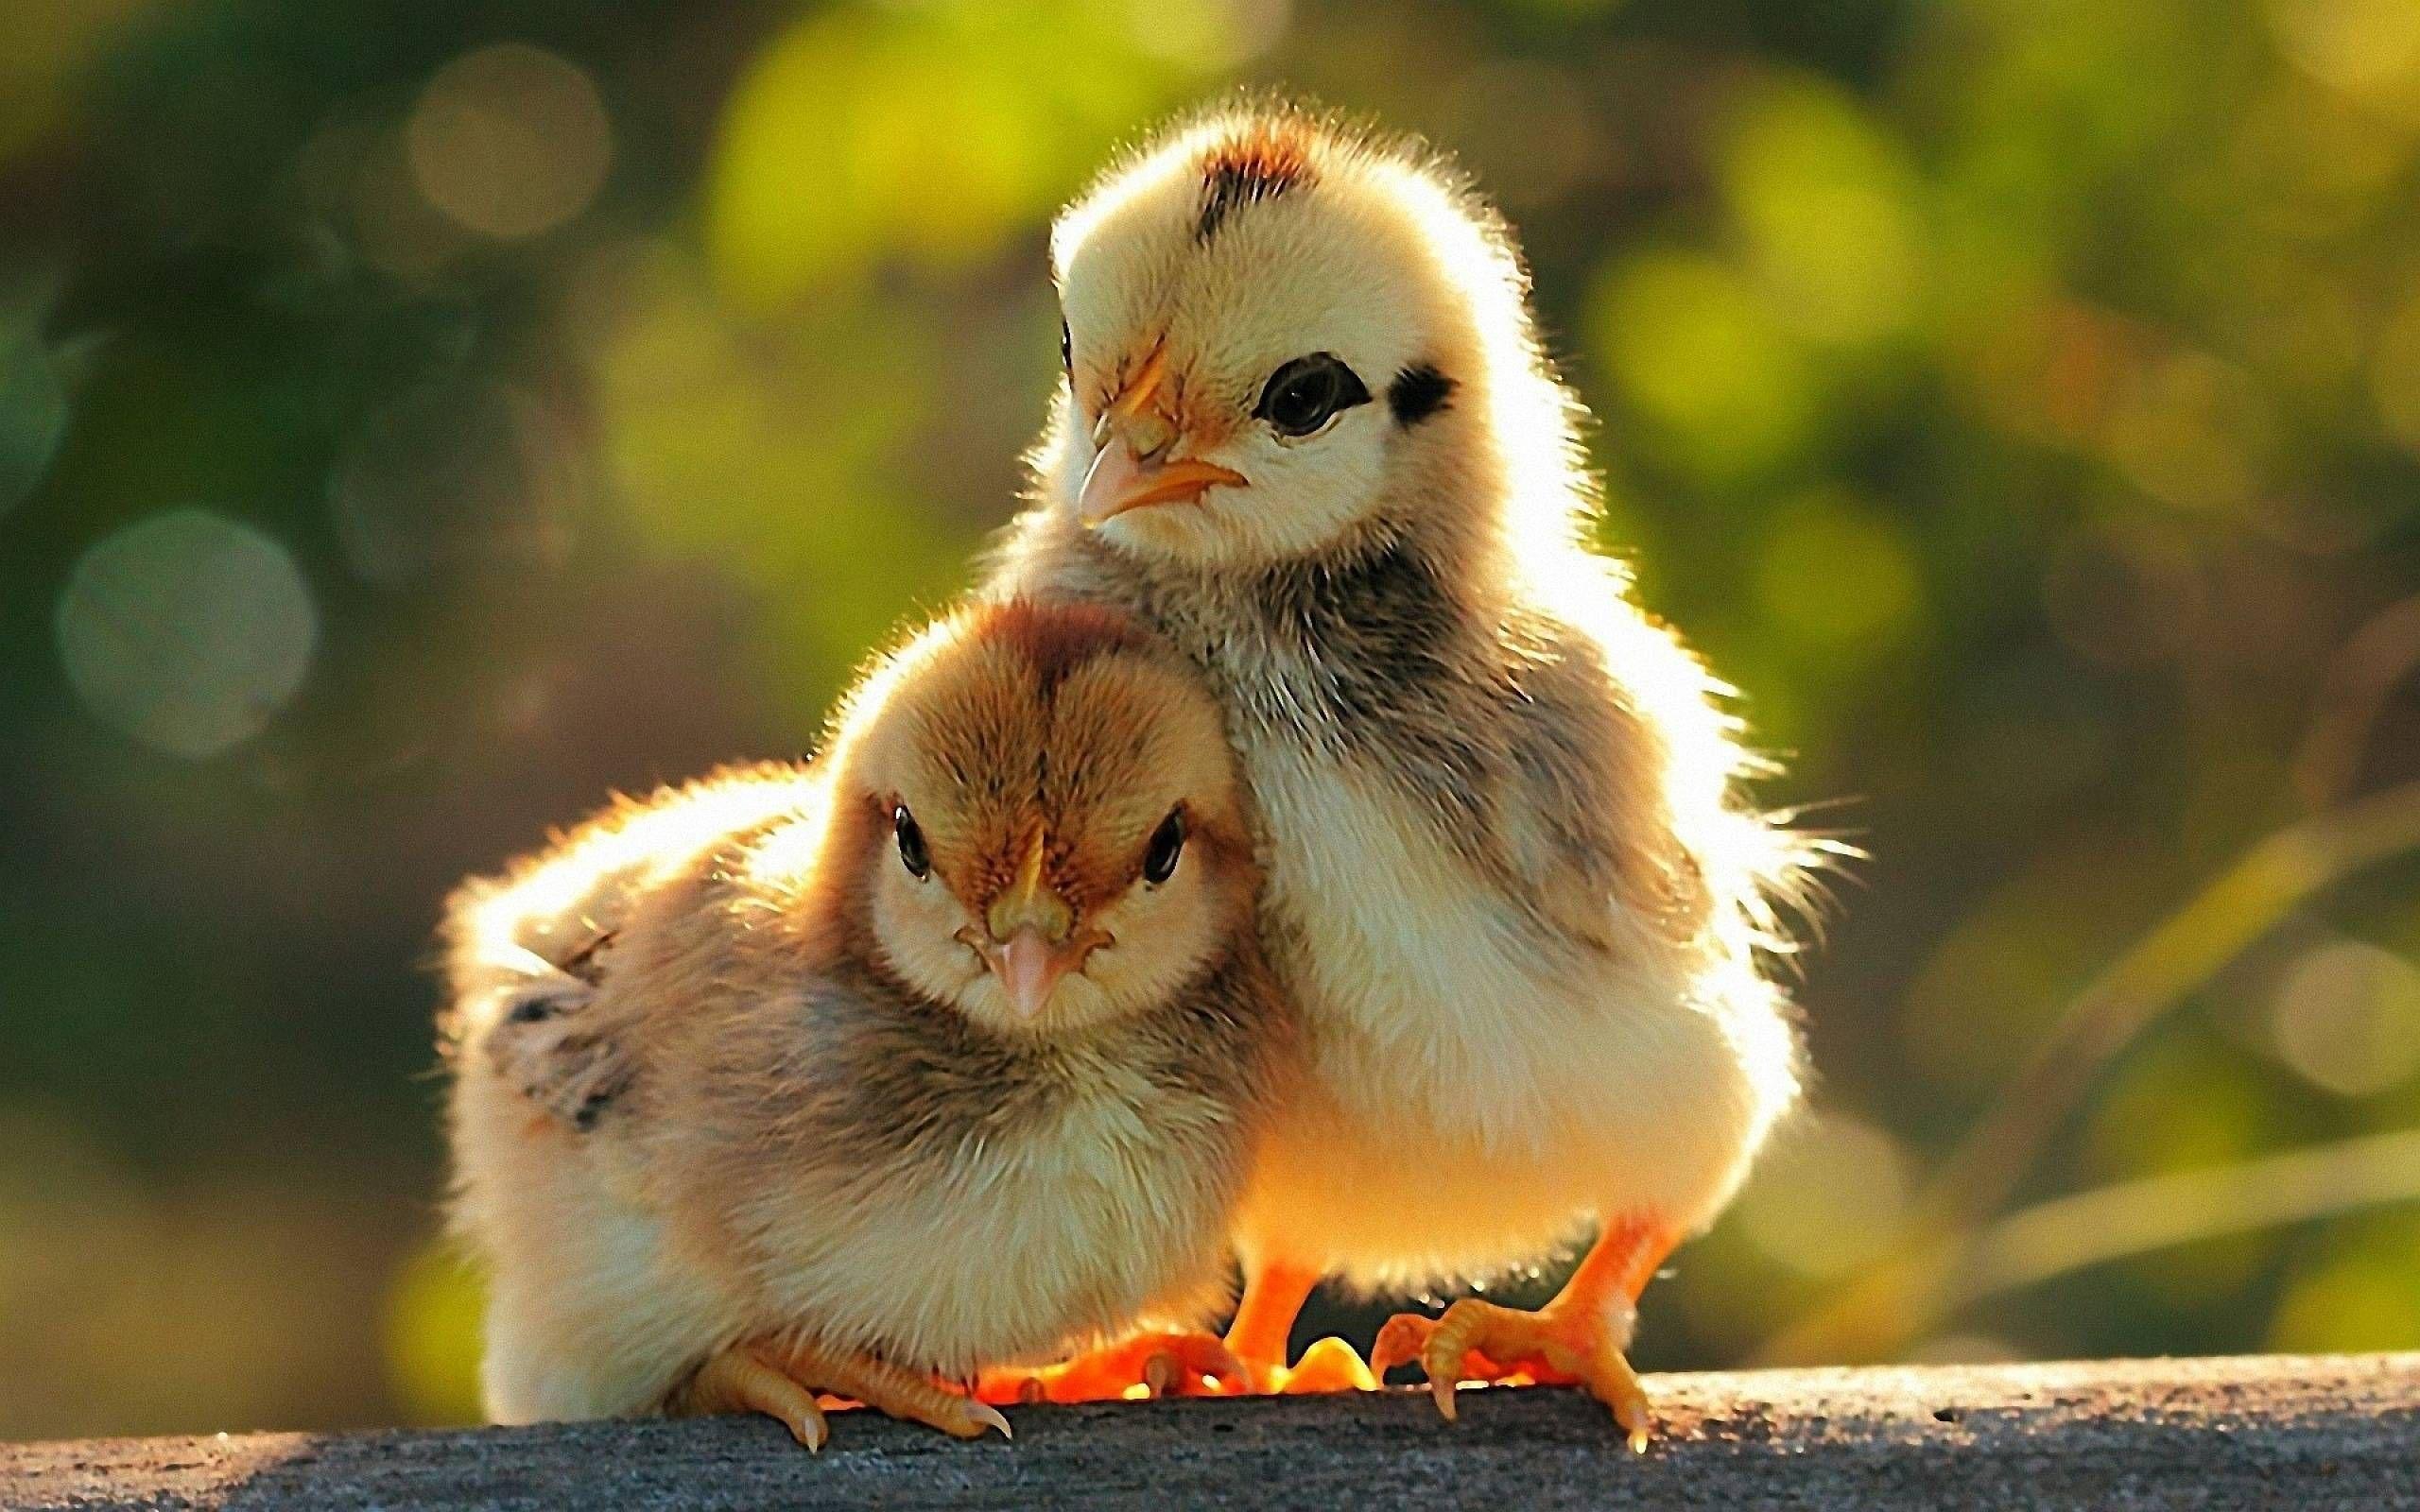 Lovely Chiks [2560x1600]